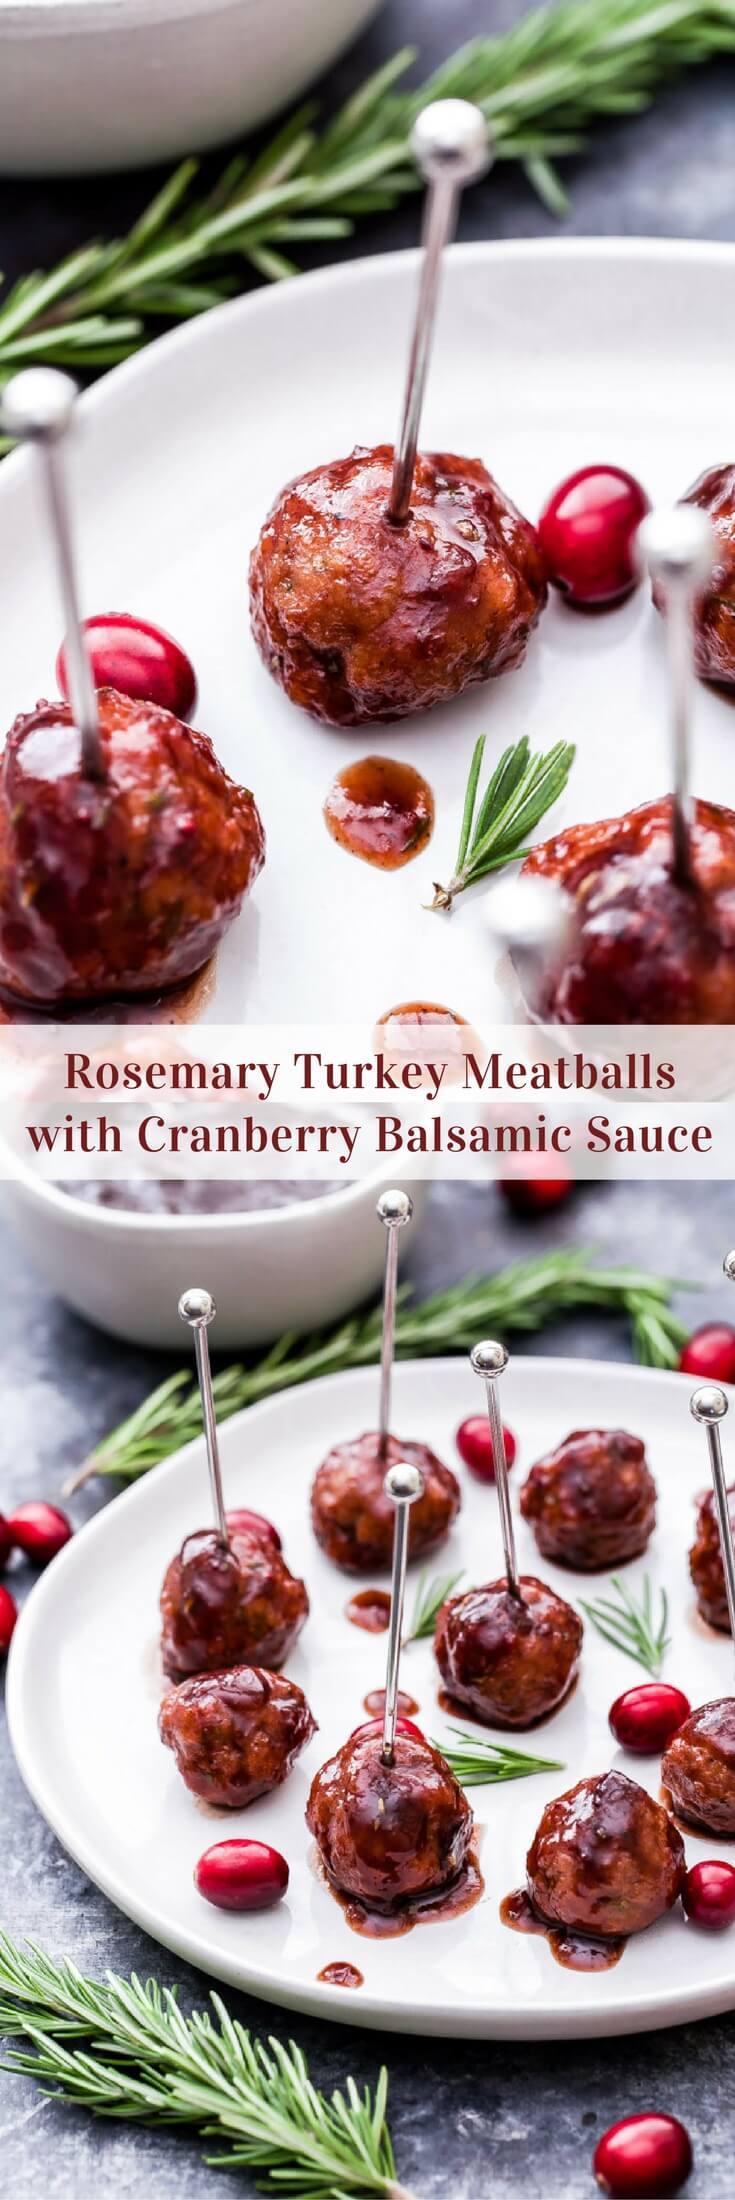 how to cook turkey meatballs in sauce